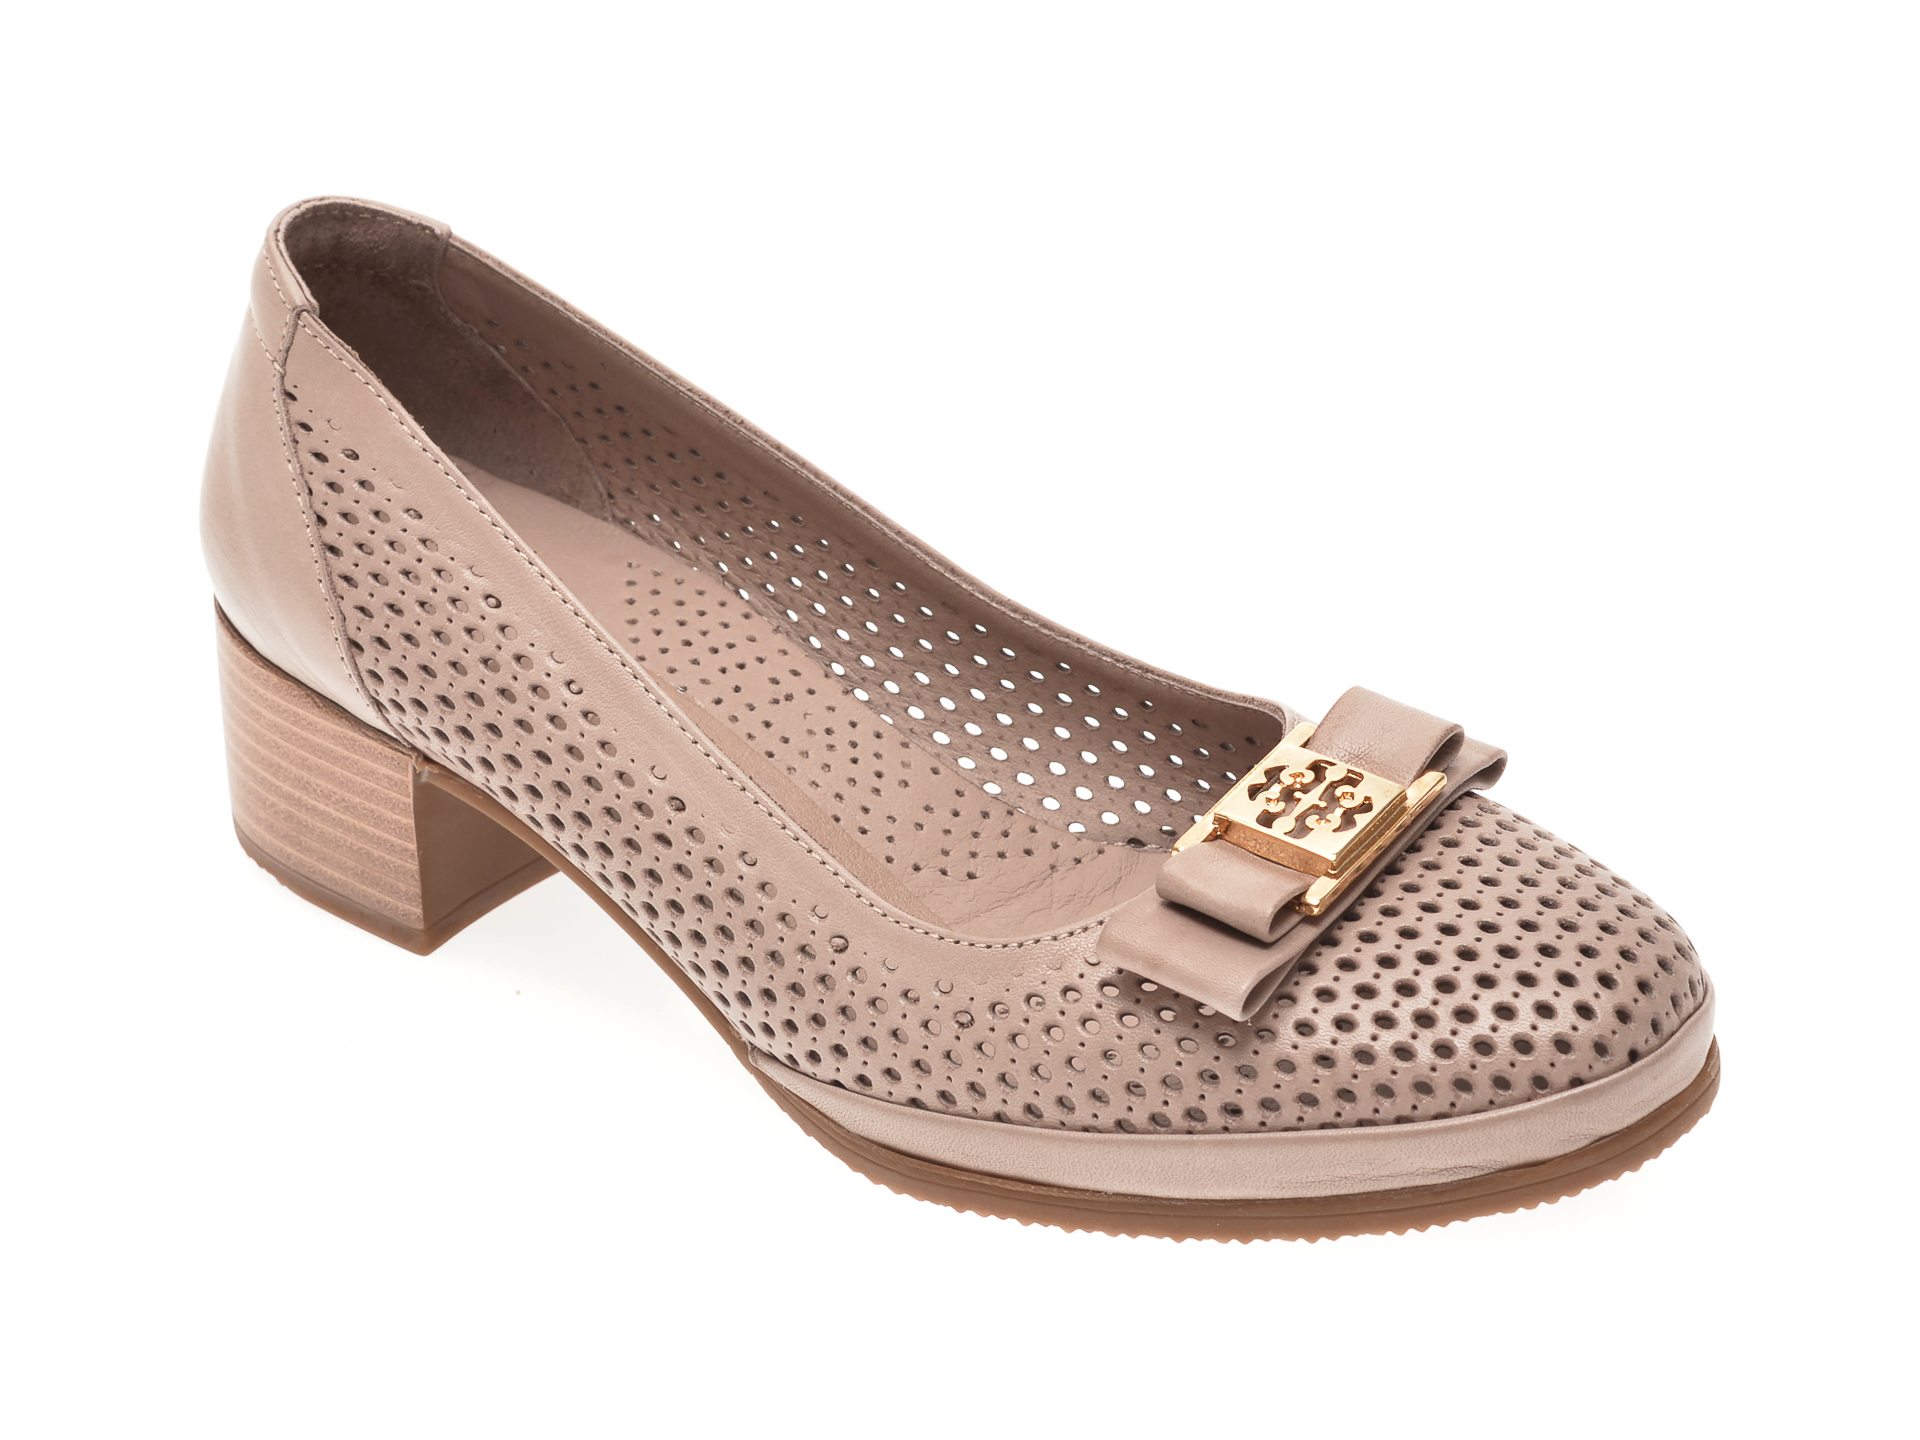 Pantofi FLAVIA PASSINI gri, 0105081, din piele naturala